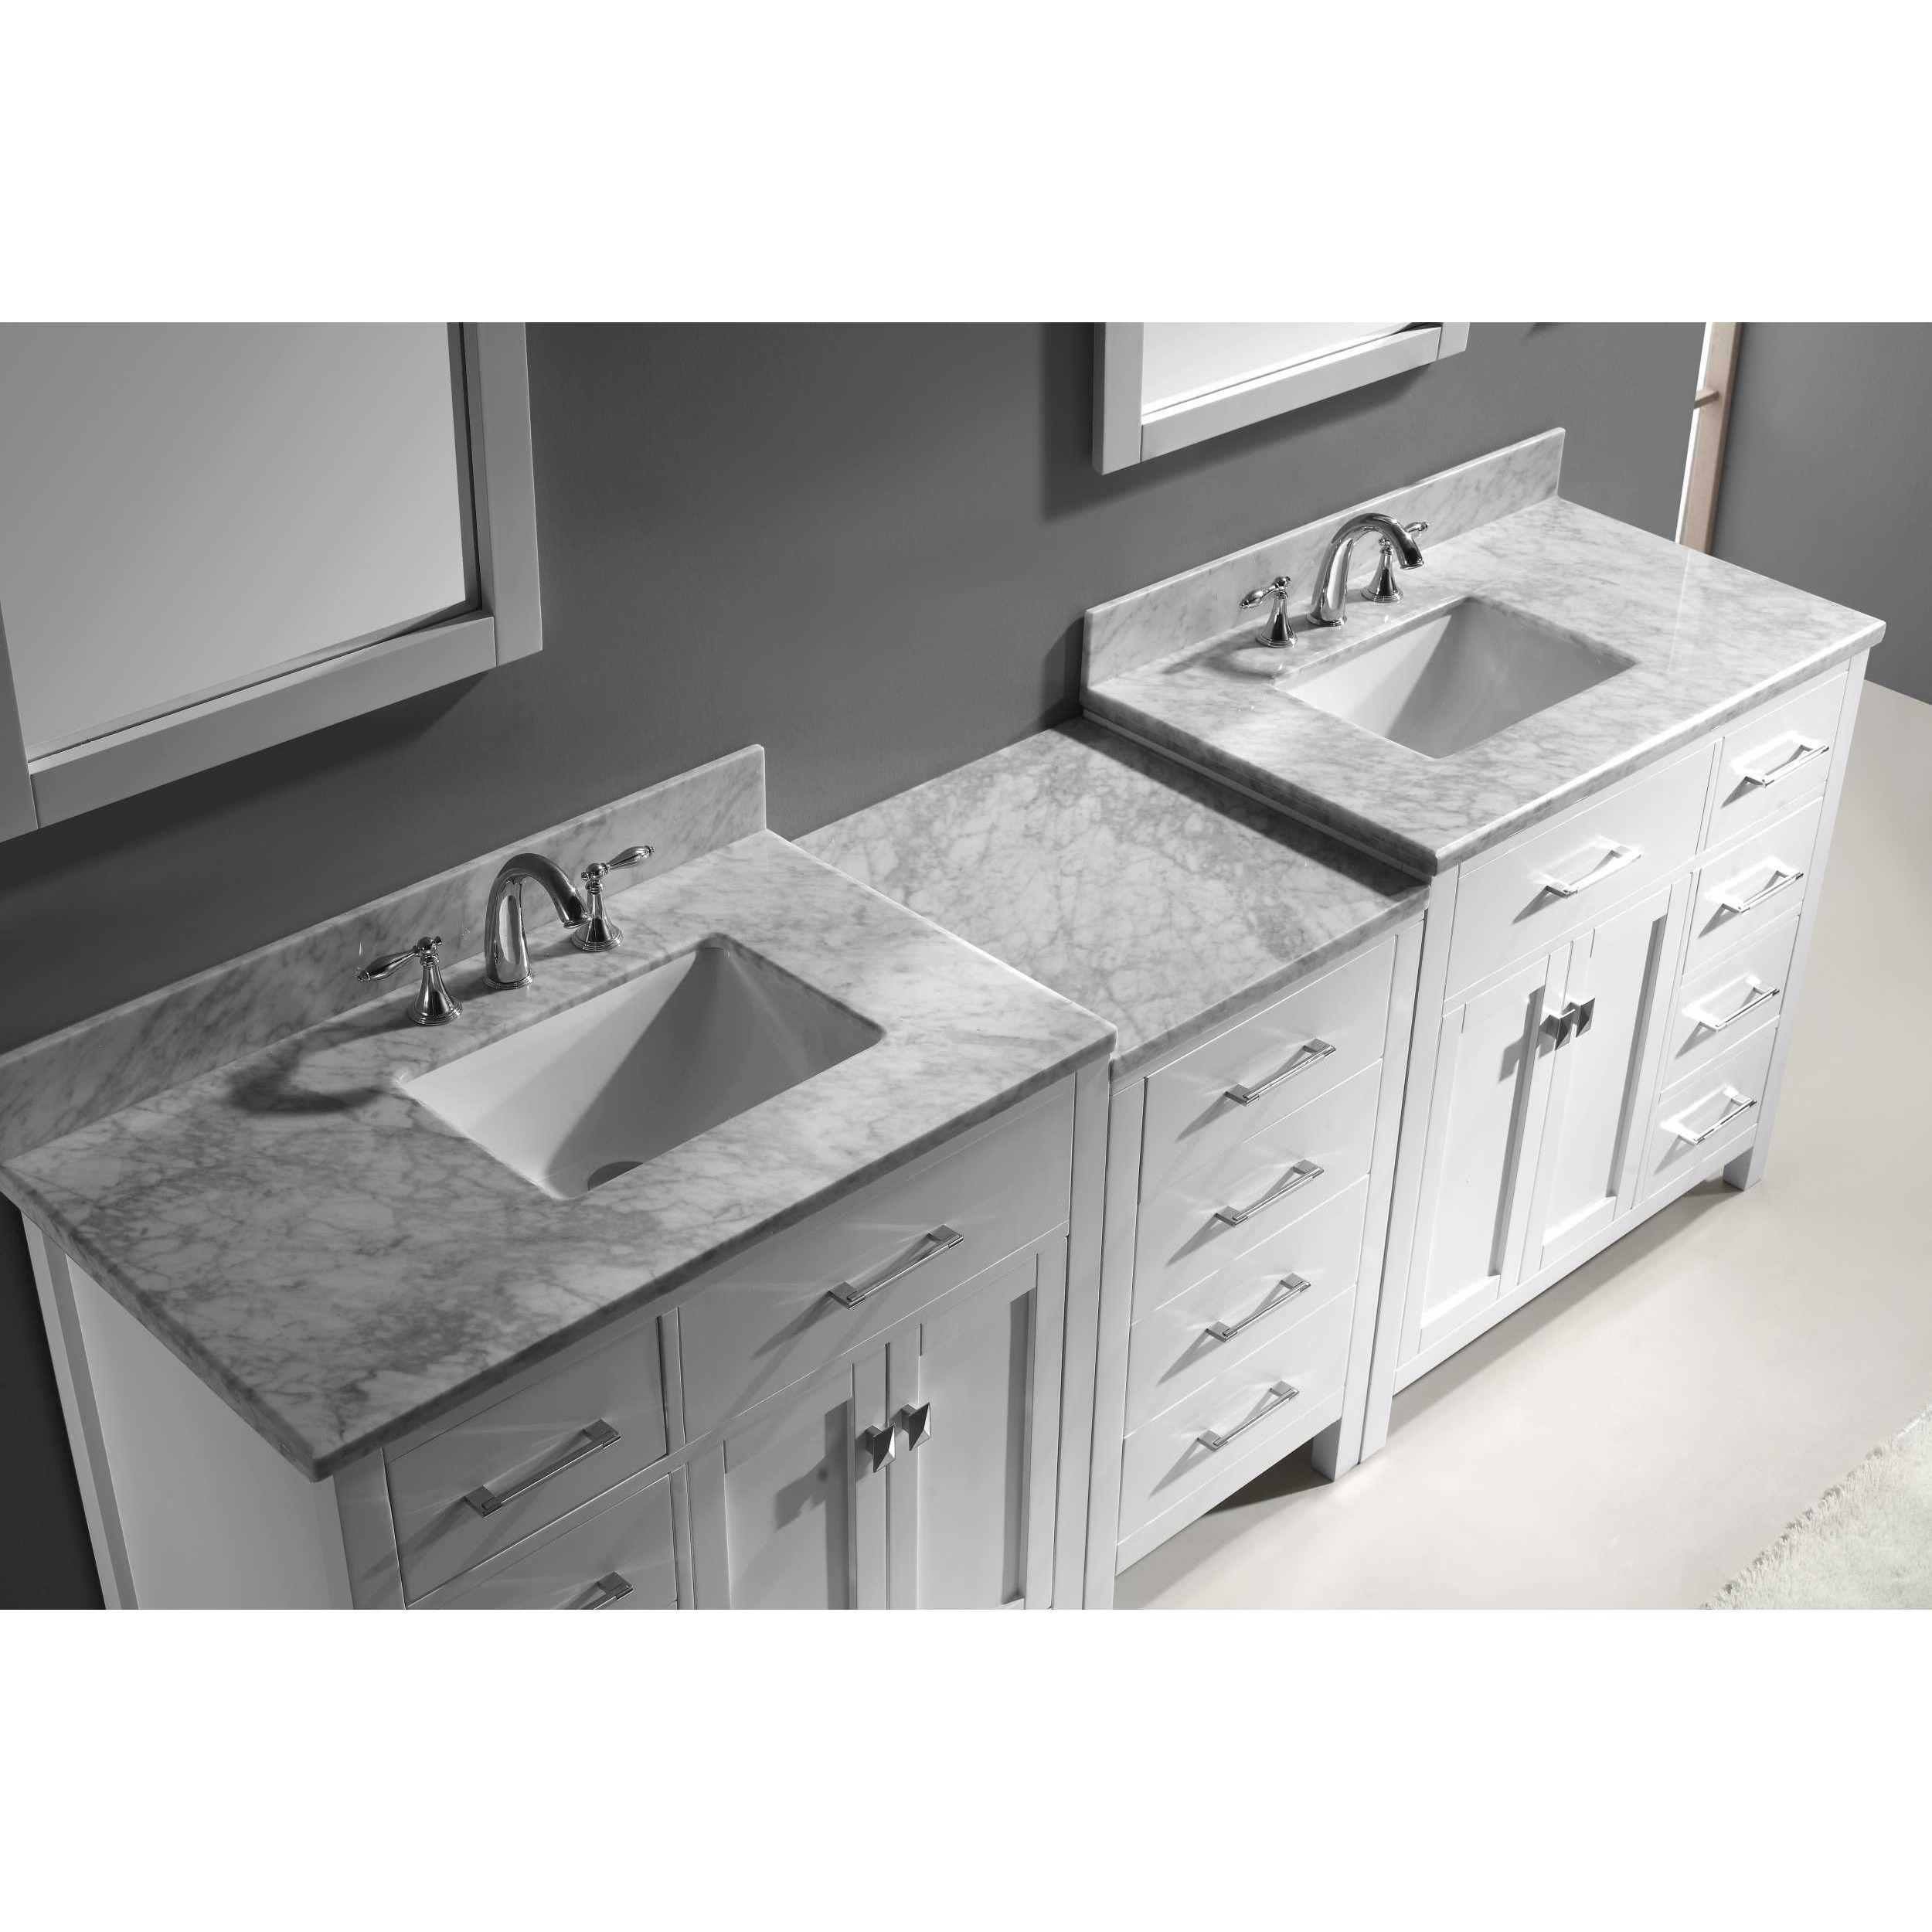 Virtu USA Caroline Parkway 93 inch Italian Carrara White Marble